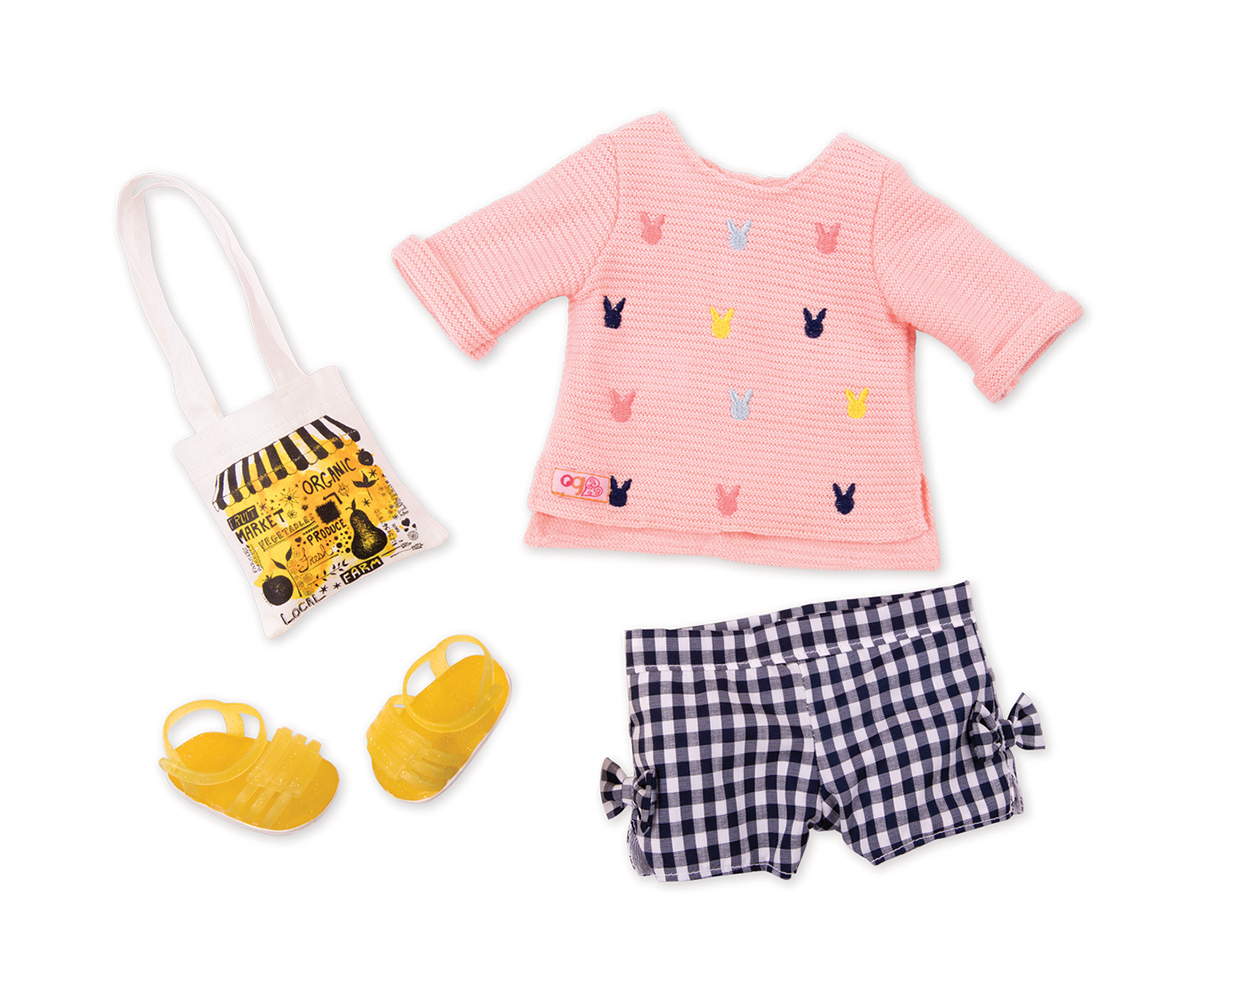 Outfit OG - Market Day for 18 Doll